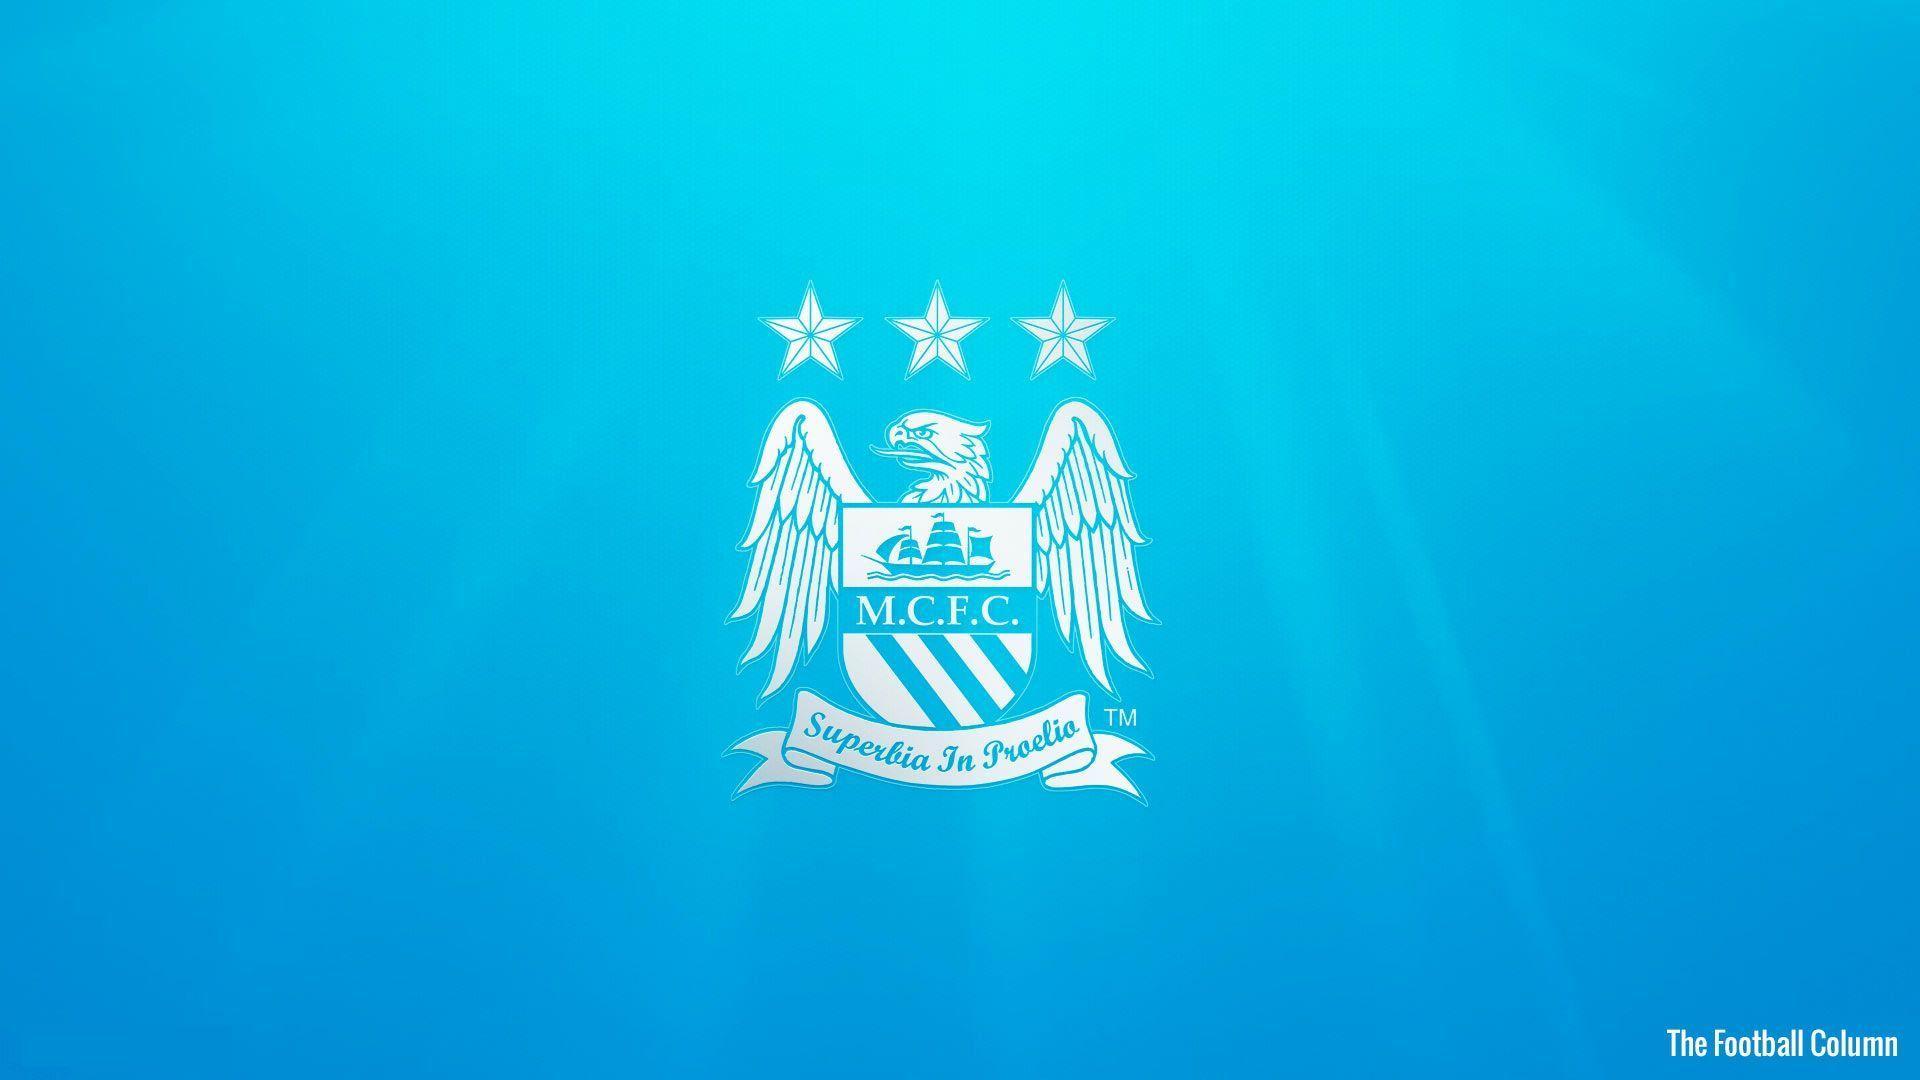 Manchester City Wallpaper: Manchester City Wallpapers 2016